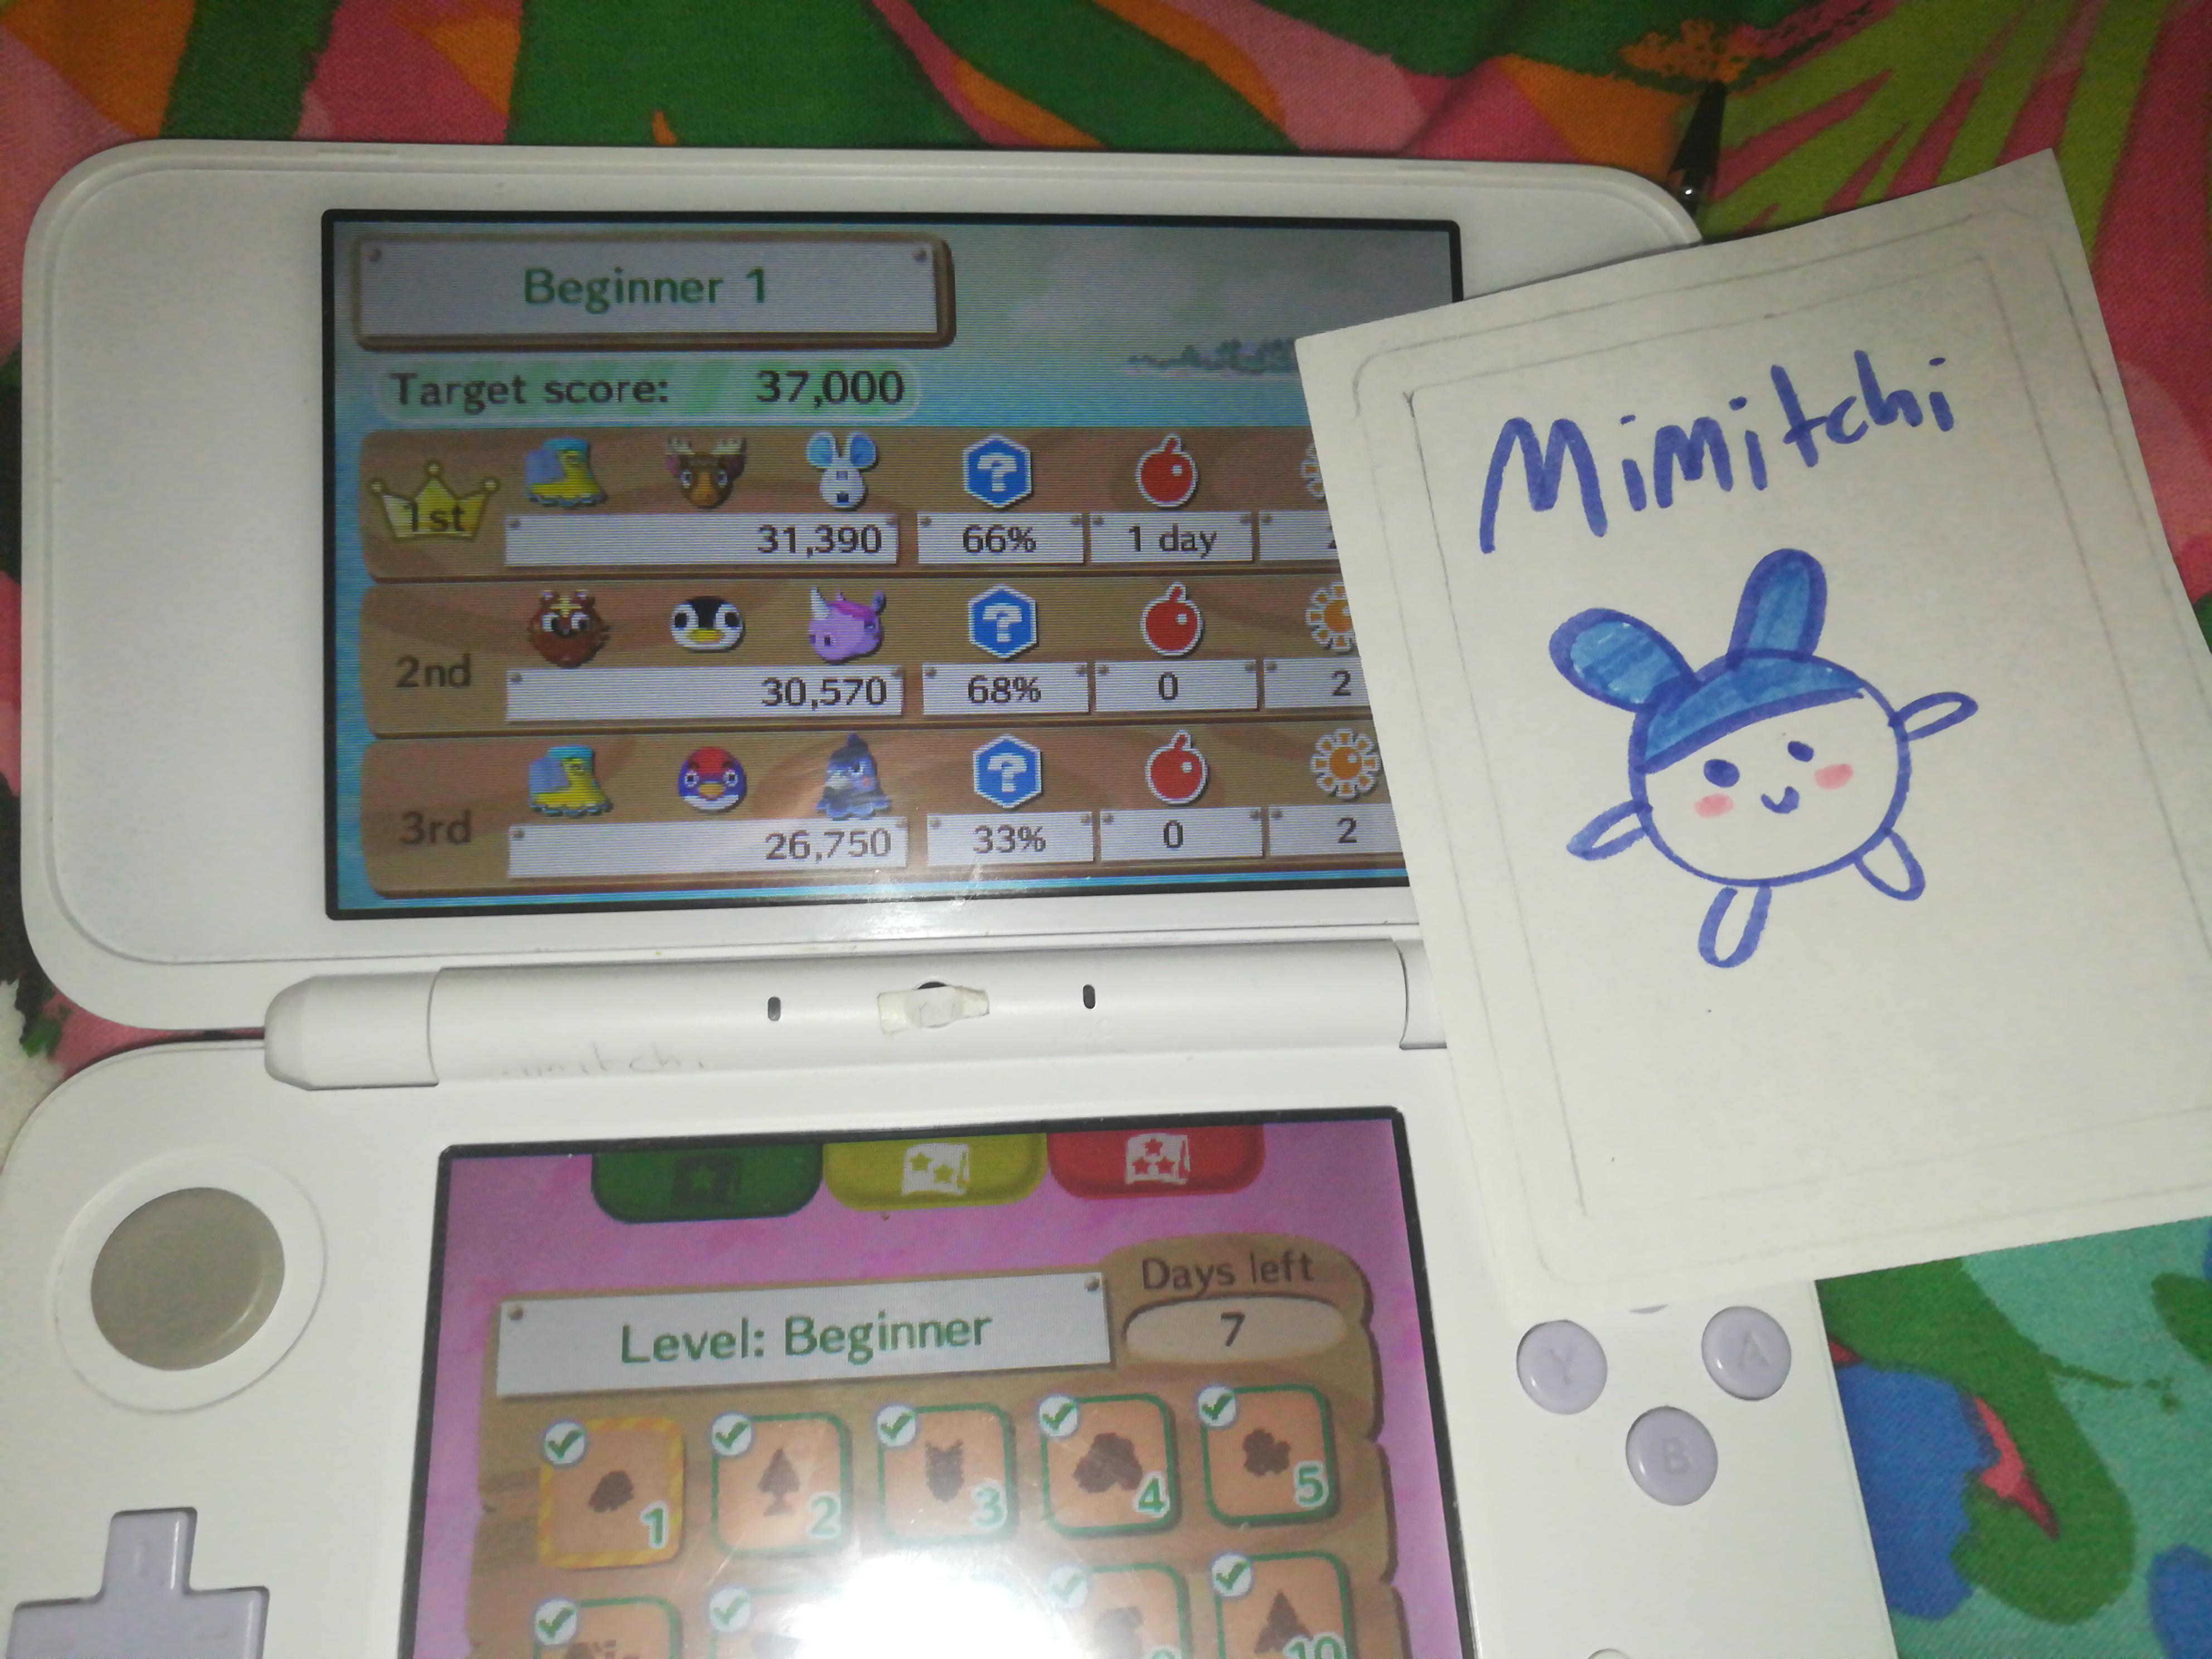 Mimitchi: Animal Crossing: New Leaf: Desert Island Escape [Beginner 01] (Nintendo 3DS) 31,390 points on 2020-02-16 04:17:17